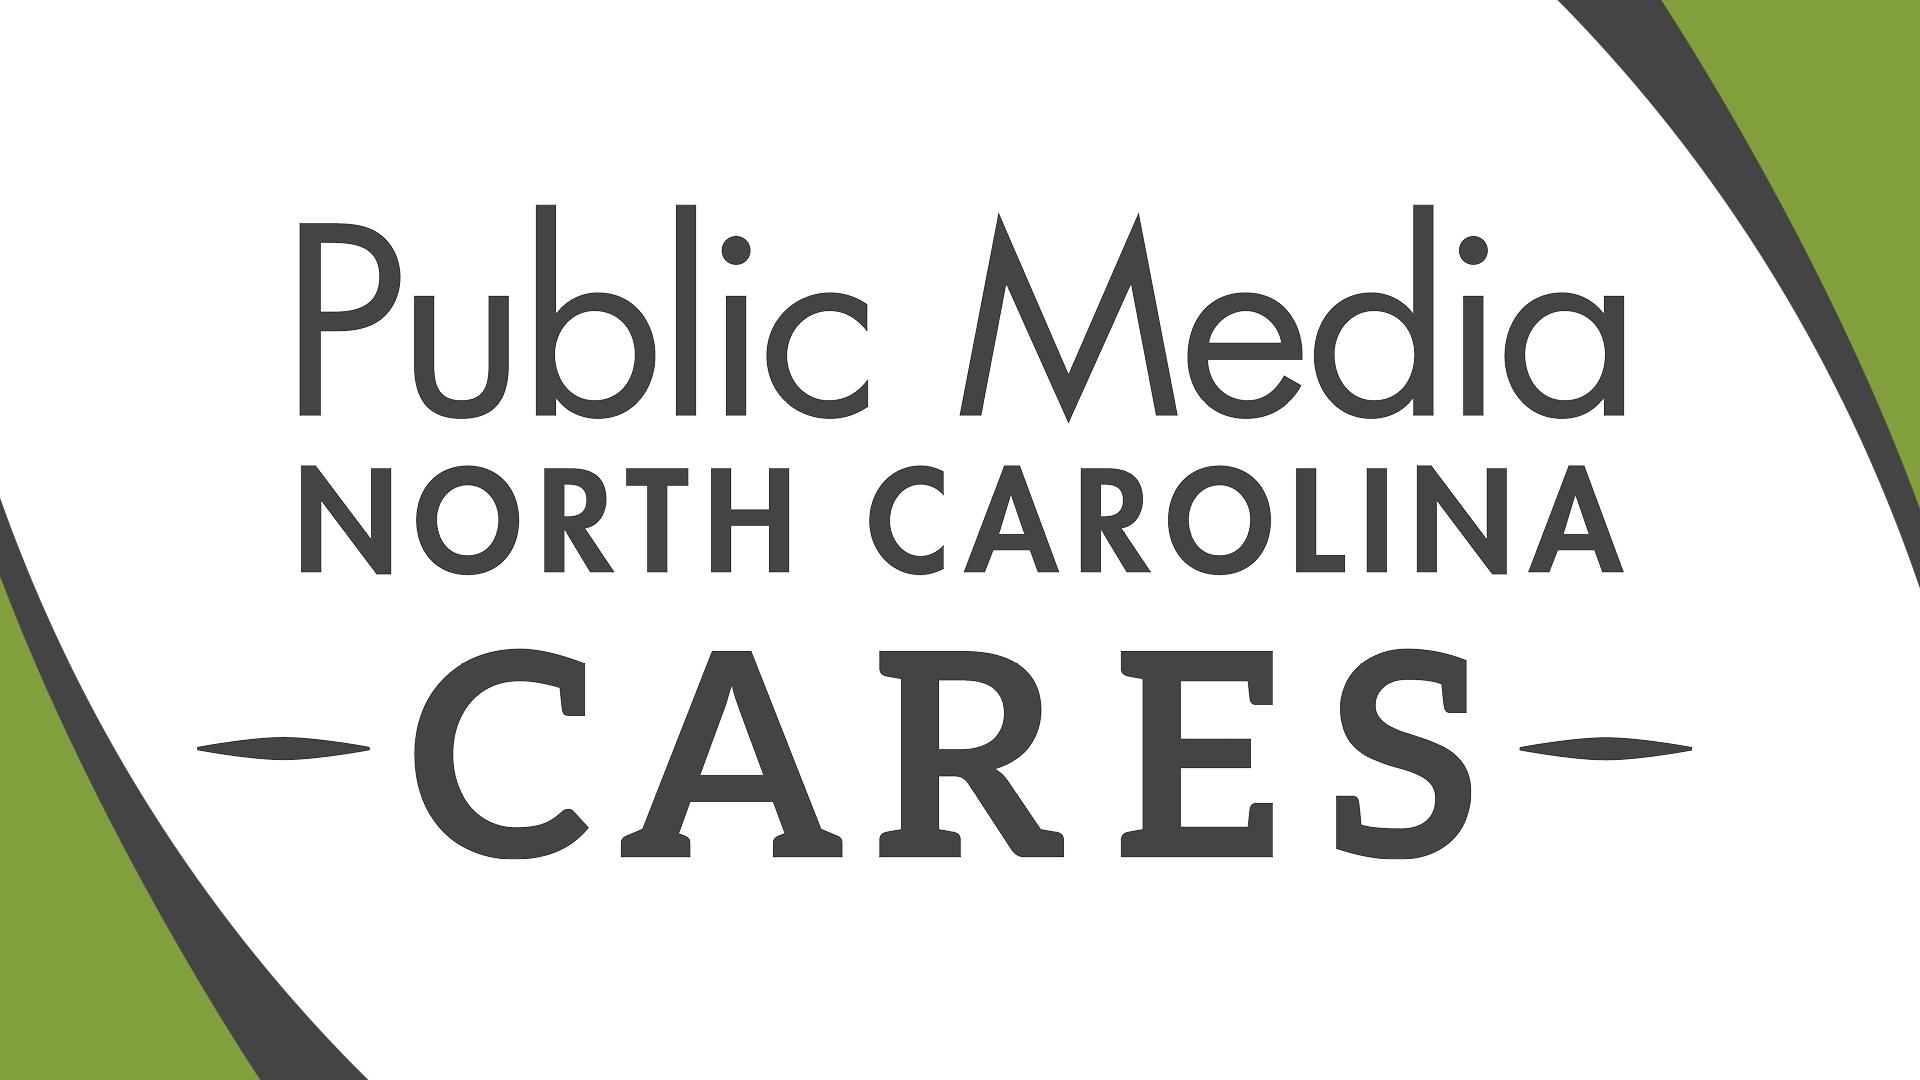 Public Media North Carolina CARES